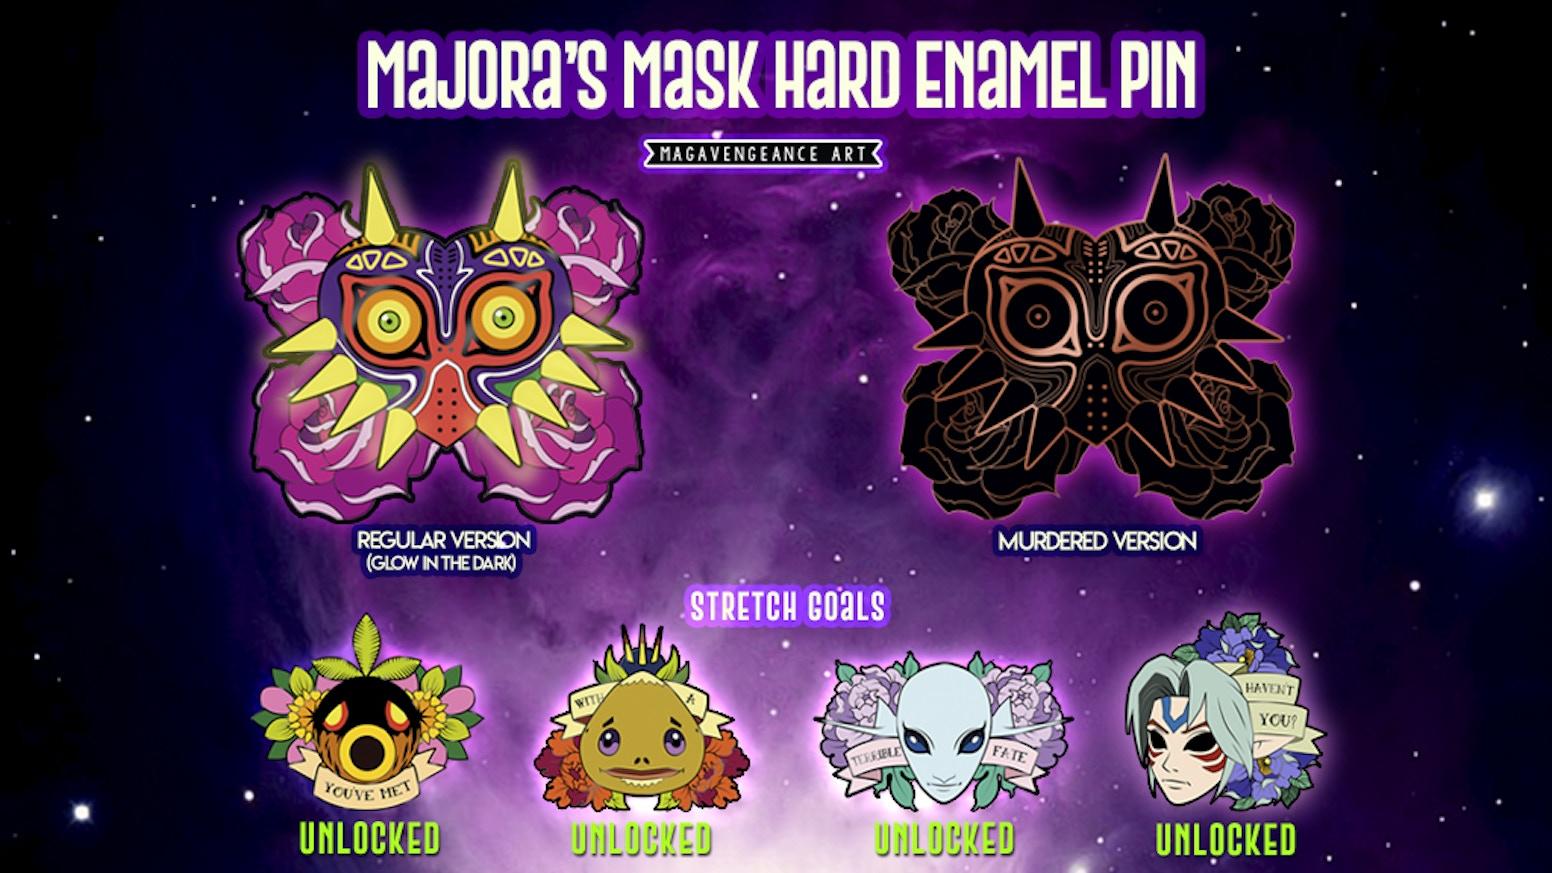 The Legend of Zelda Majora's Mask Pins + stretch goals by MagaVengeance Art  — Kickstarter